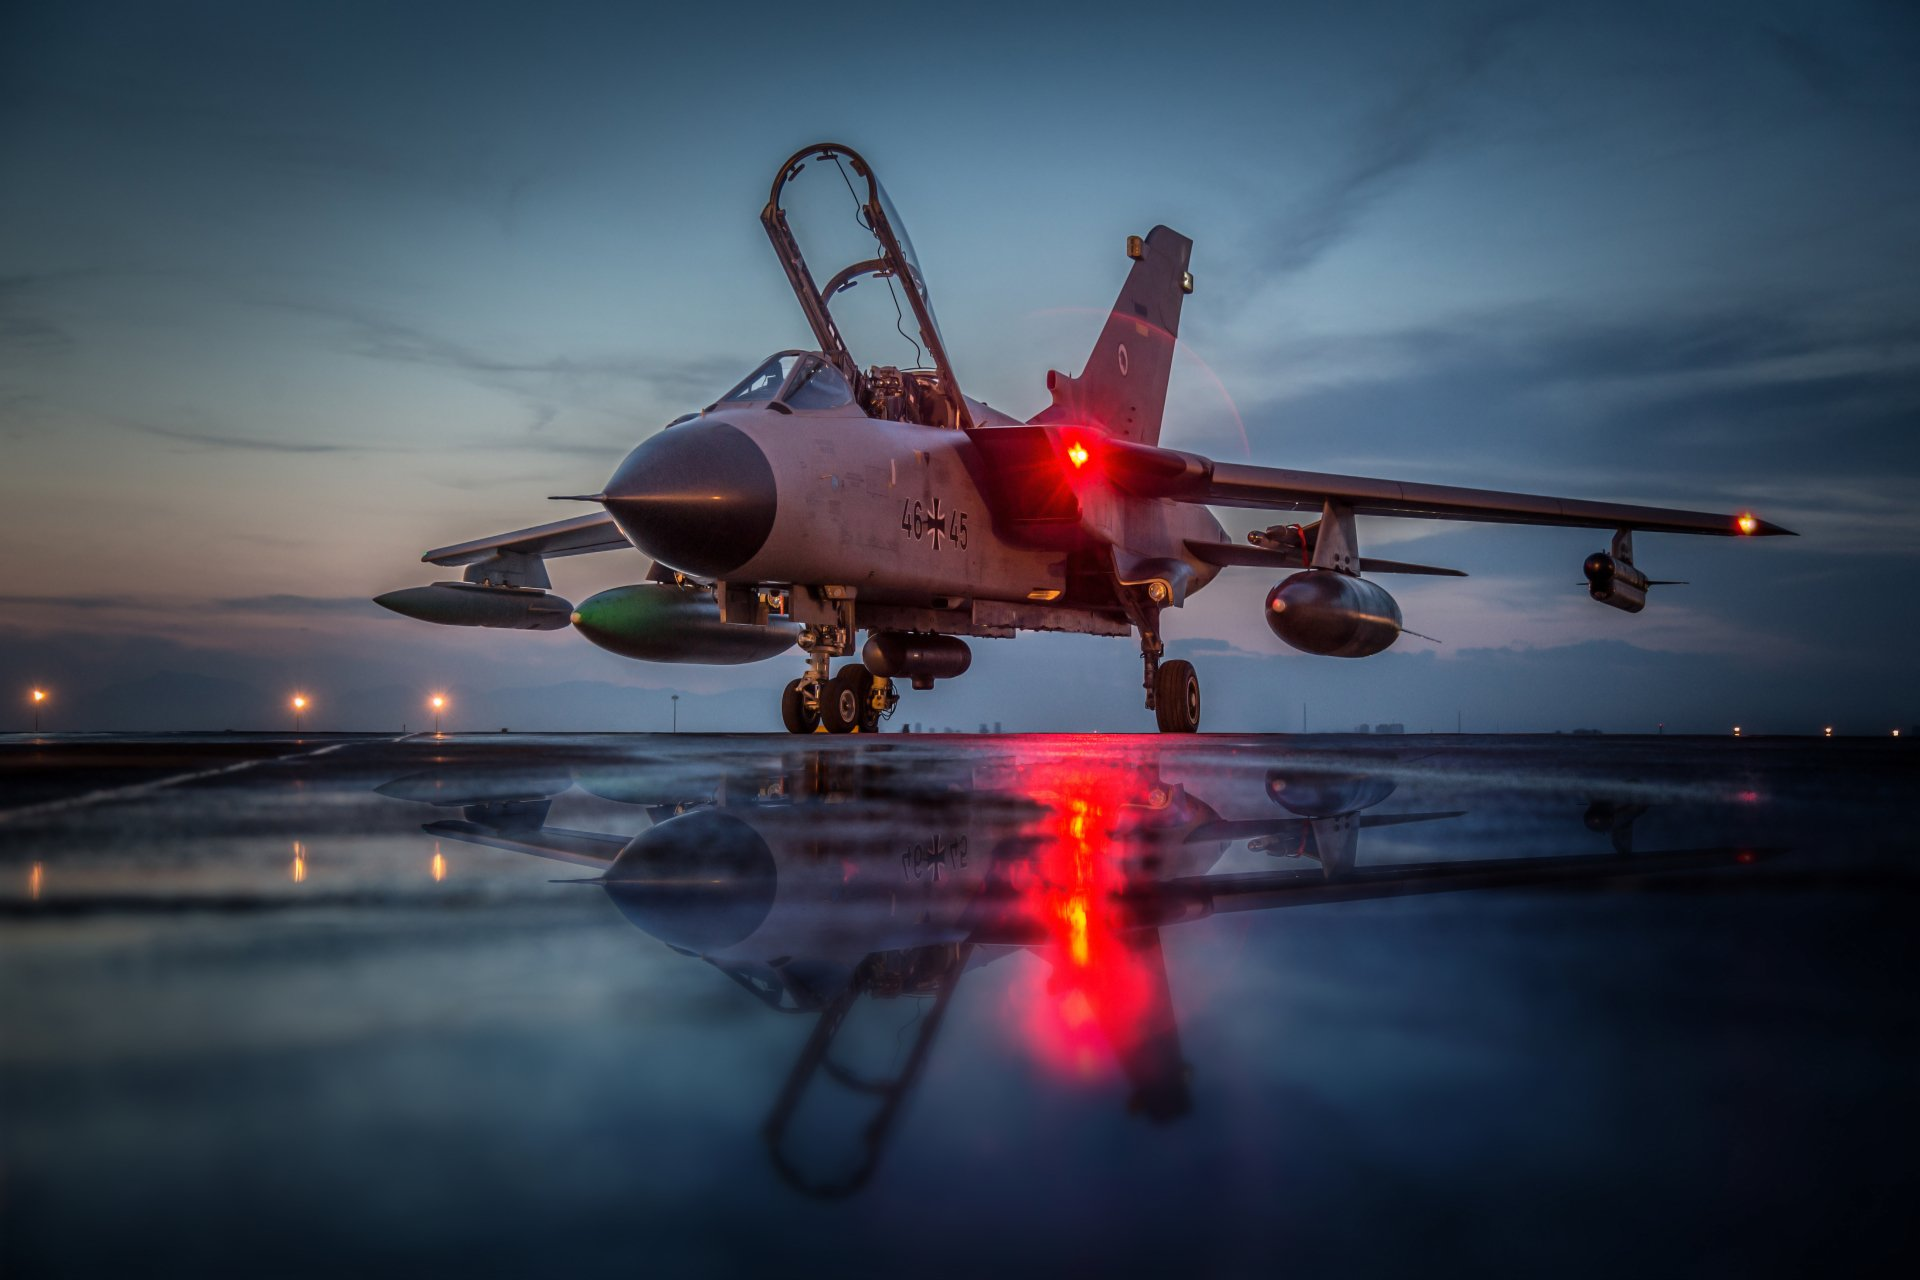 Military - Panavia Tornado  Jet Fighter Aircraft Warplane Reflection Wallpaper